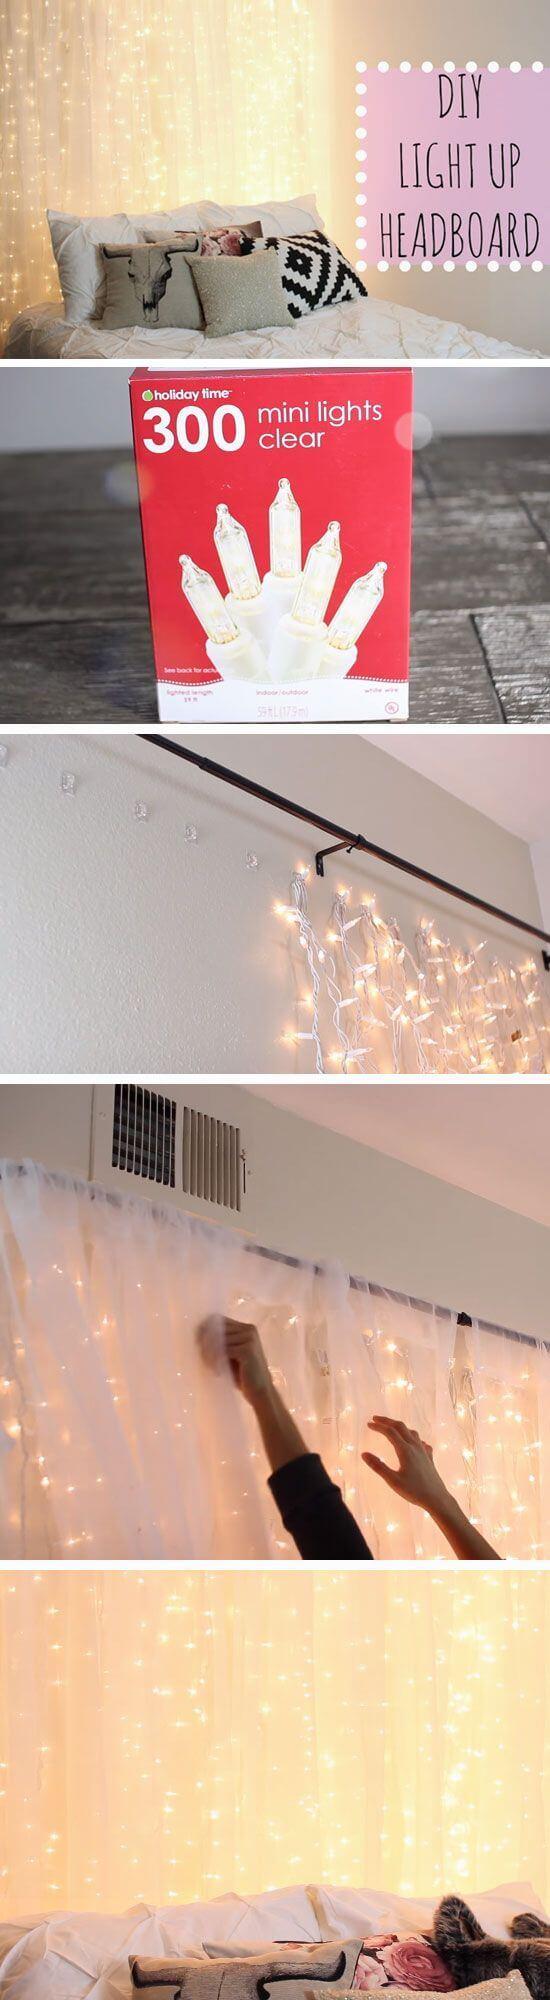 Simply Strung DIY Bedroom Fairy Lights